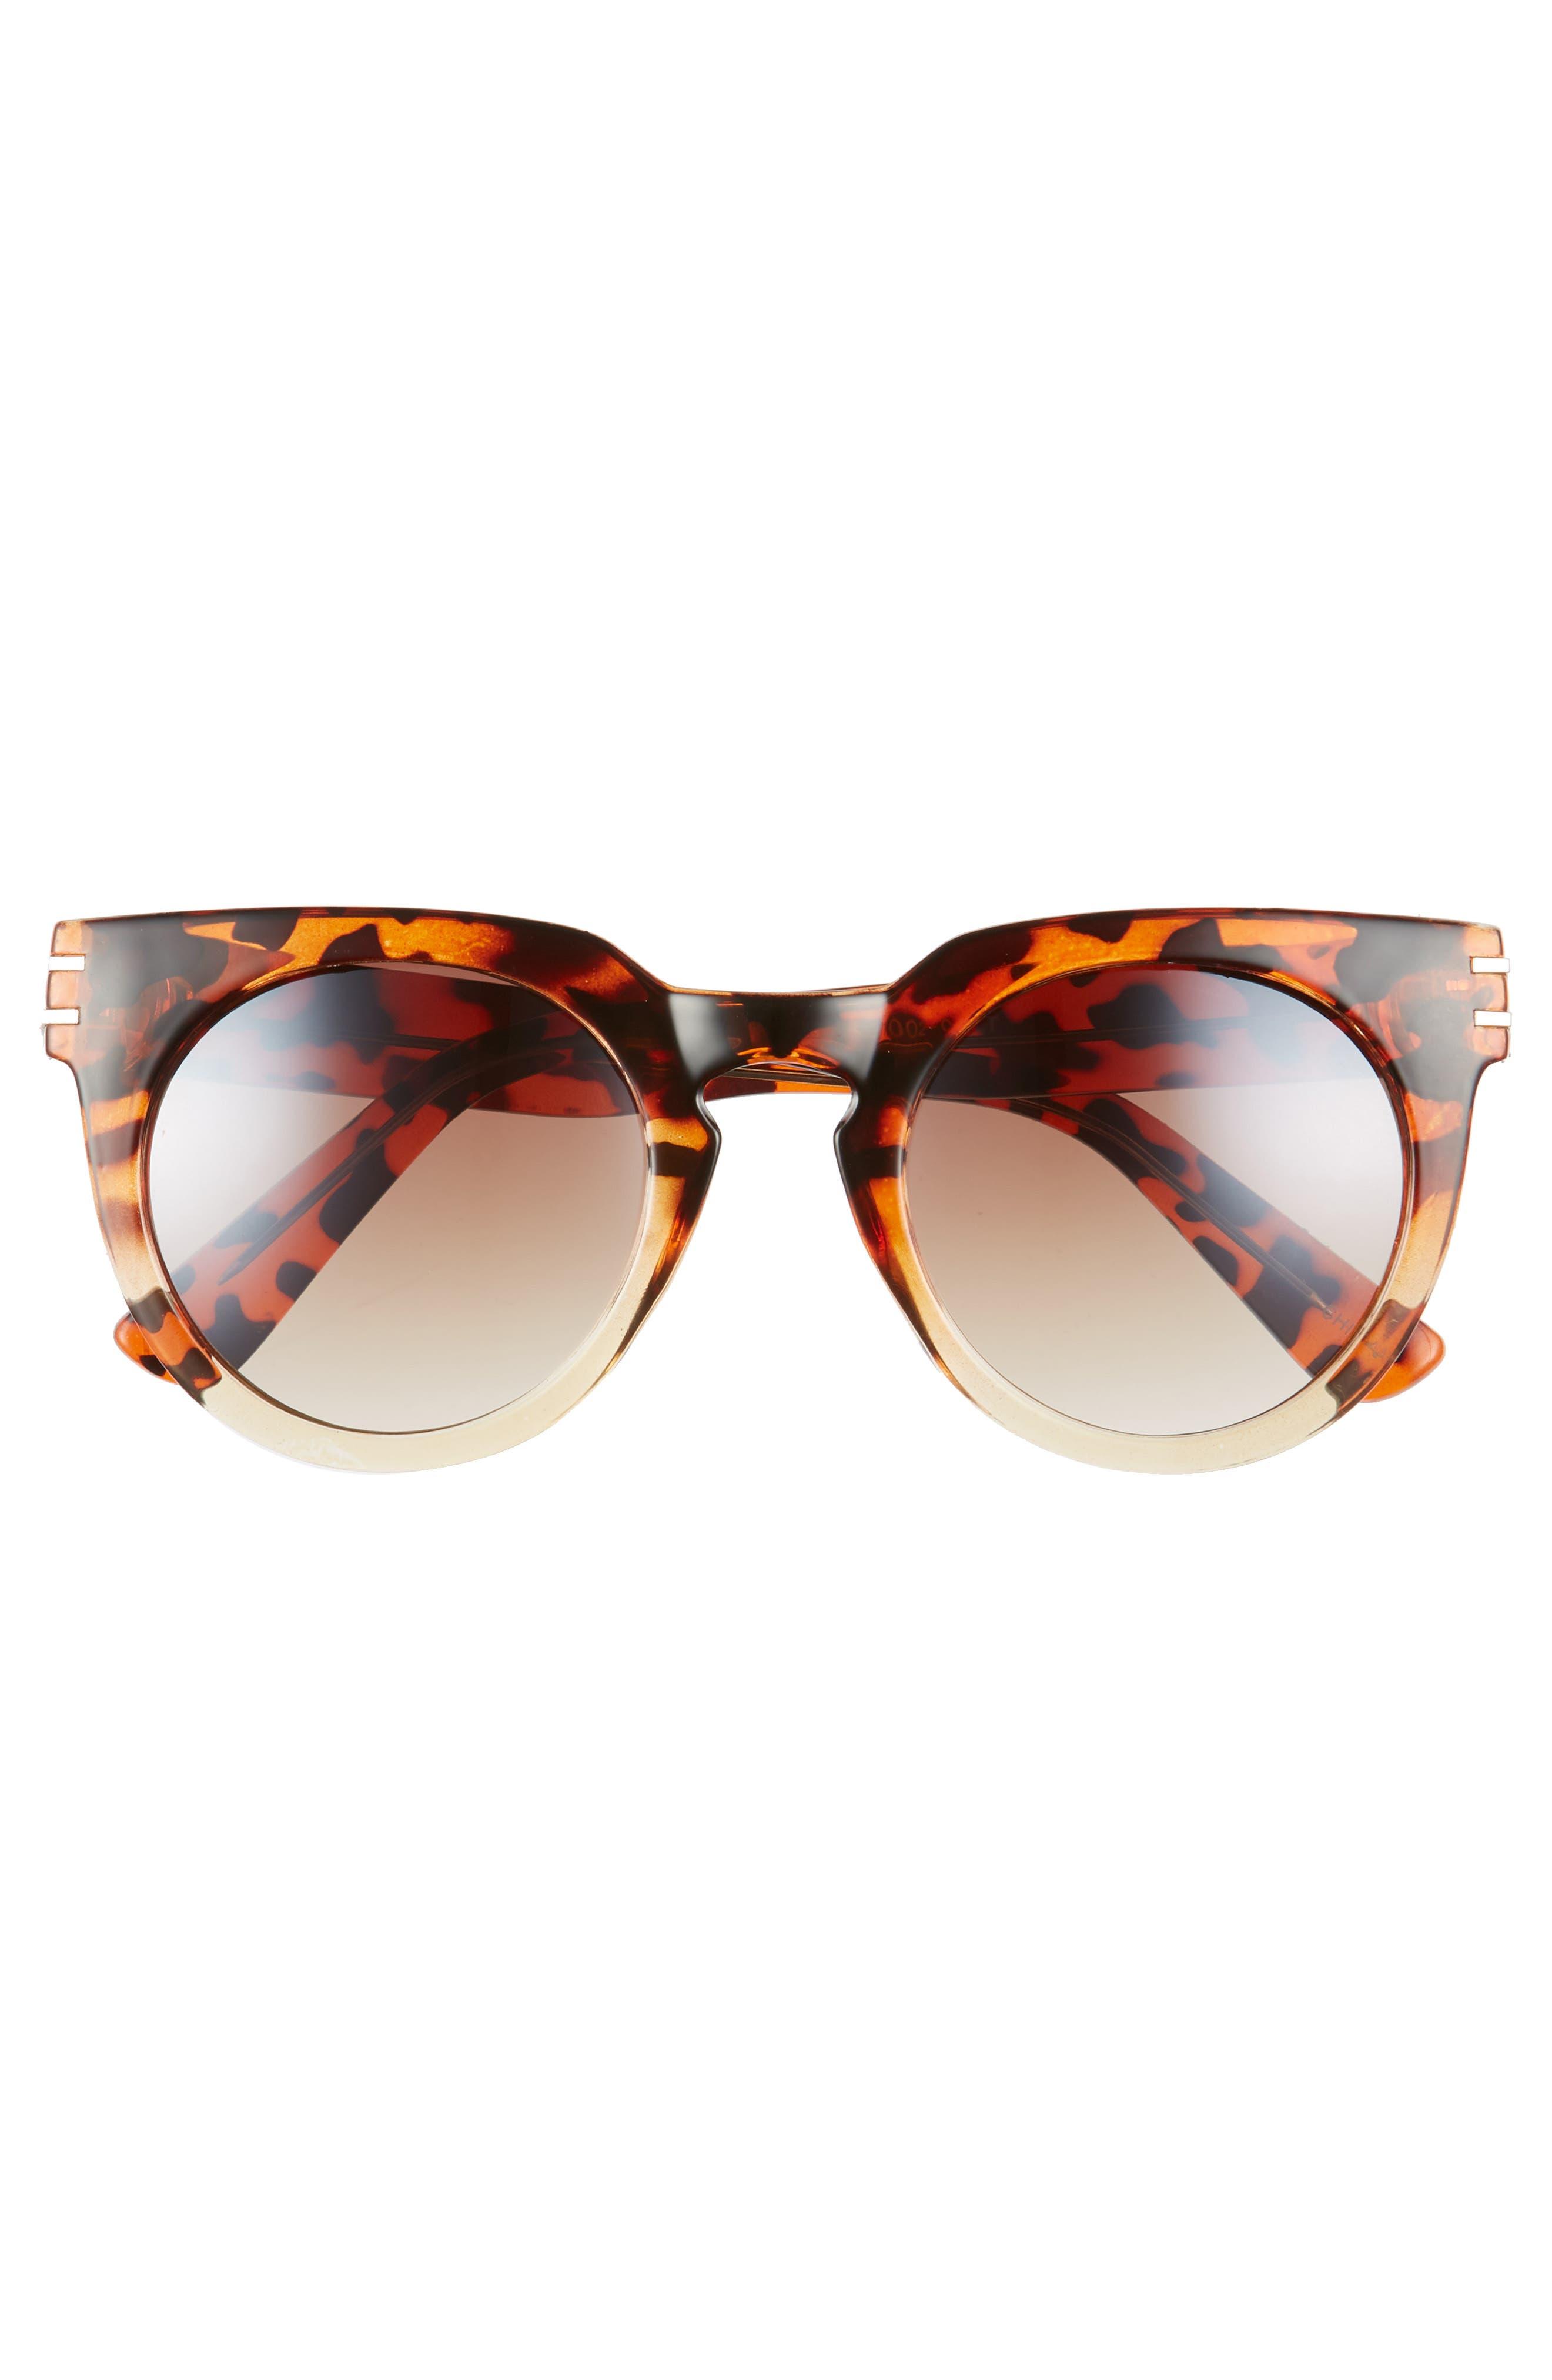 50mm Round Sunglasses,                             Alternate thumbnail 3, color,                             200